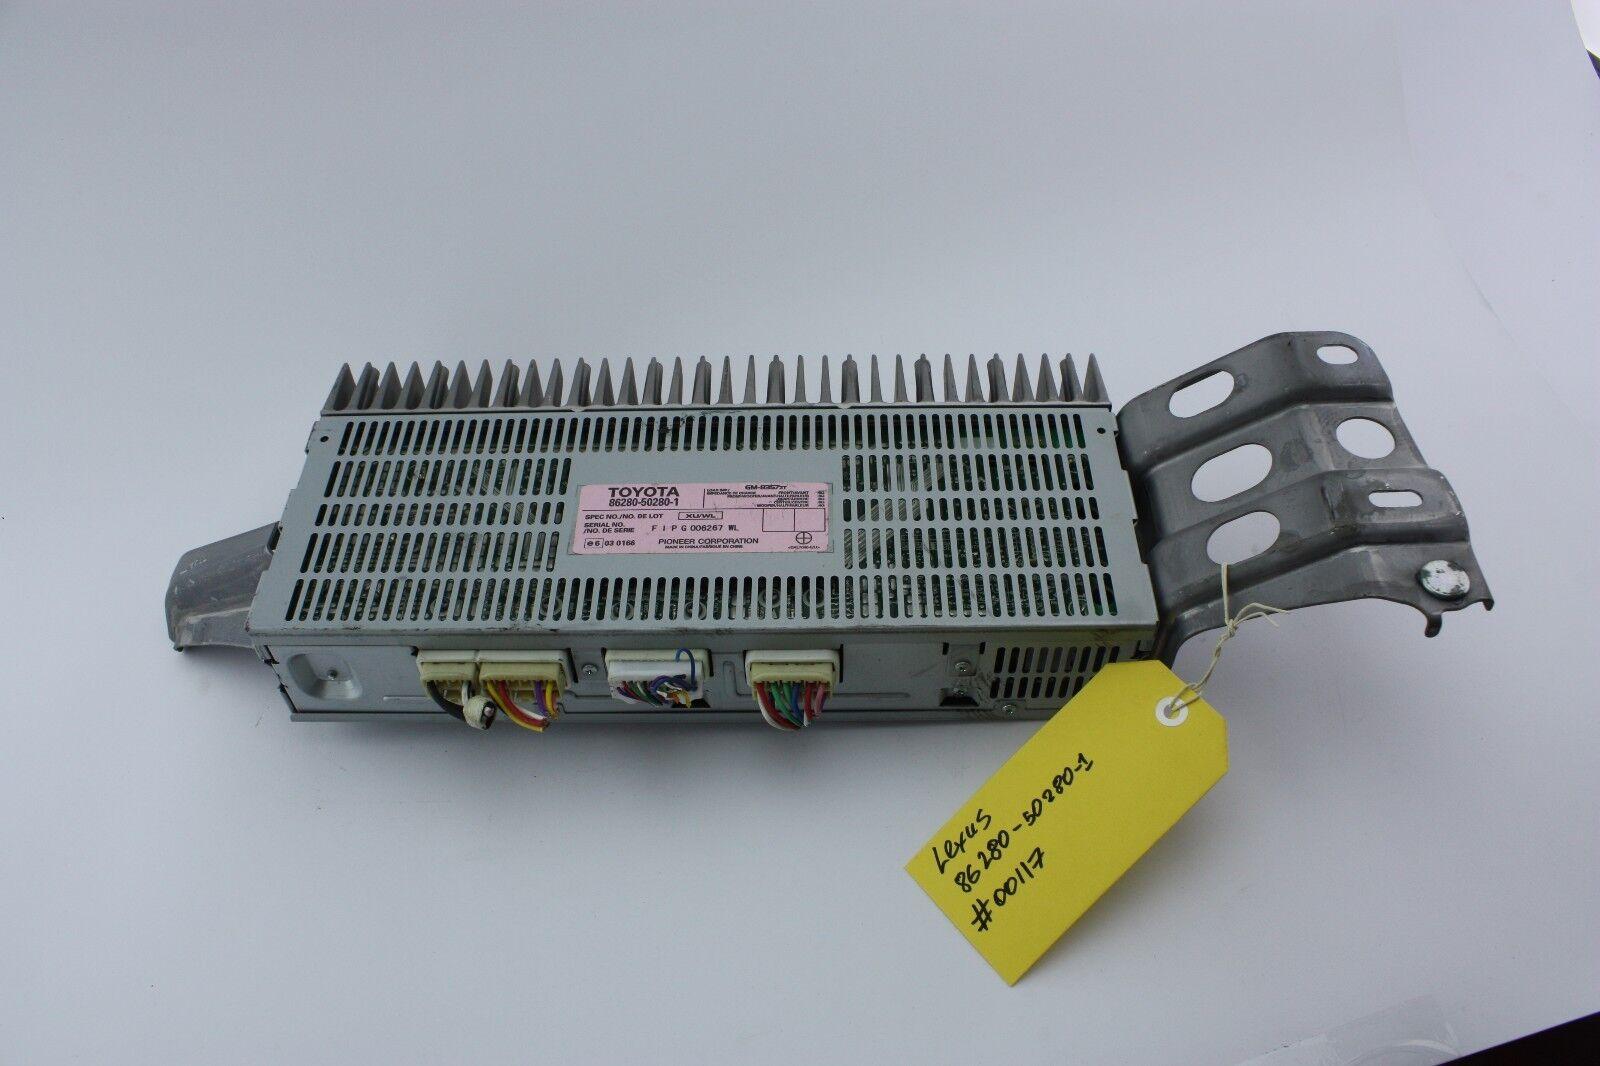 LEXUS LS430 86280-50280 -1 AMPLIFIER ASSY, STEREO COMPONENT PIONEER